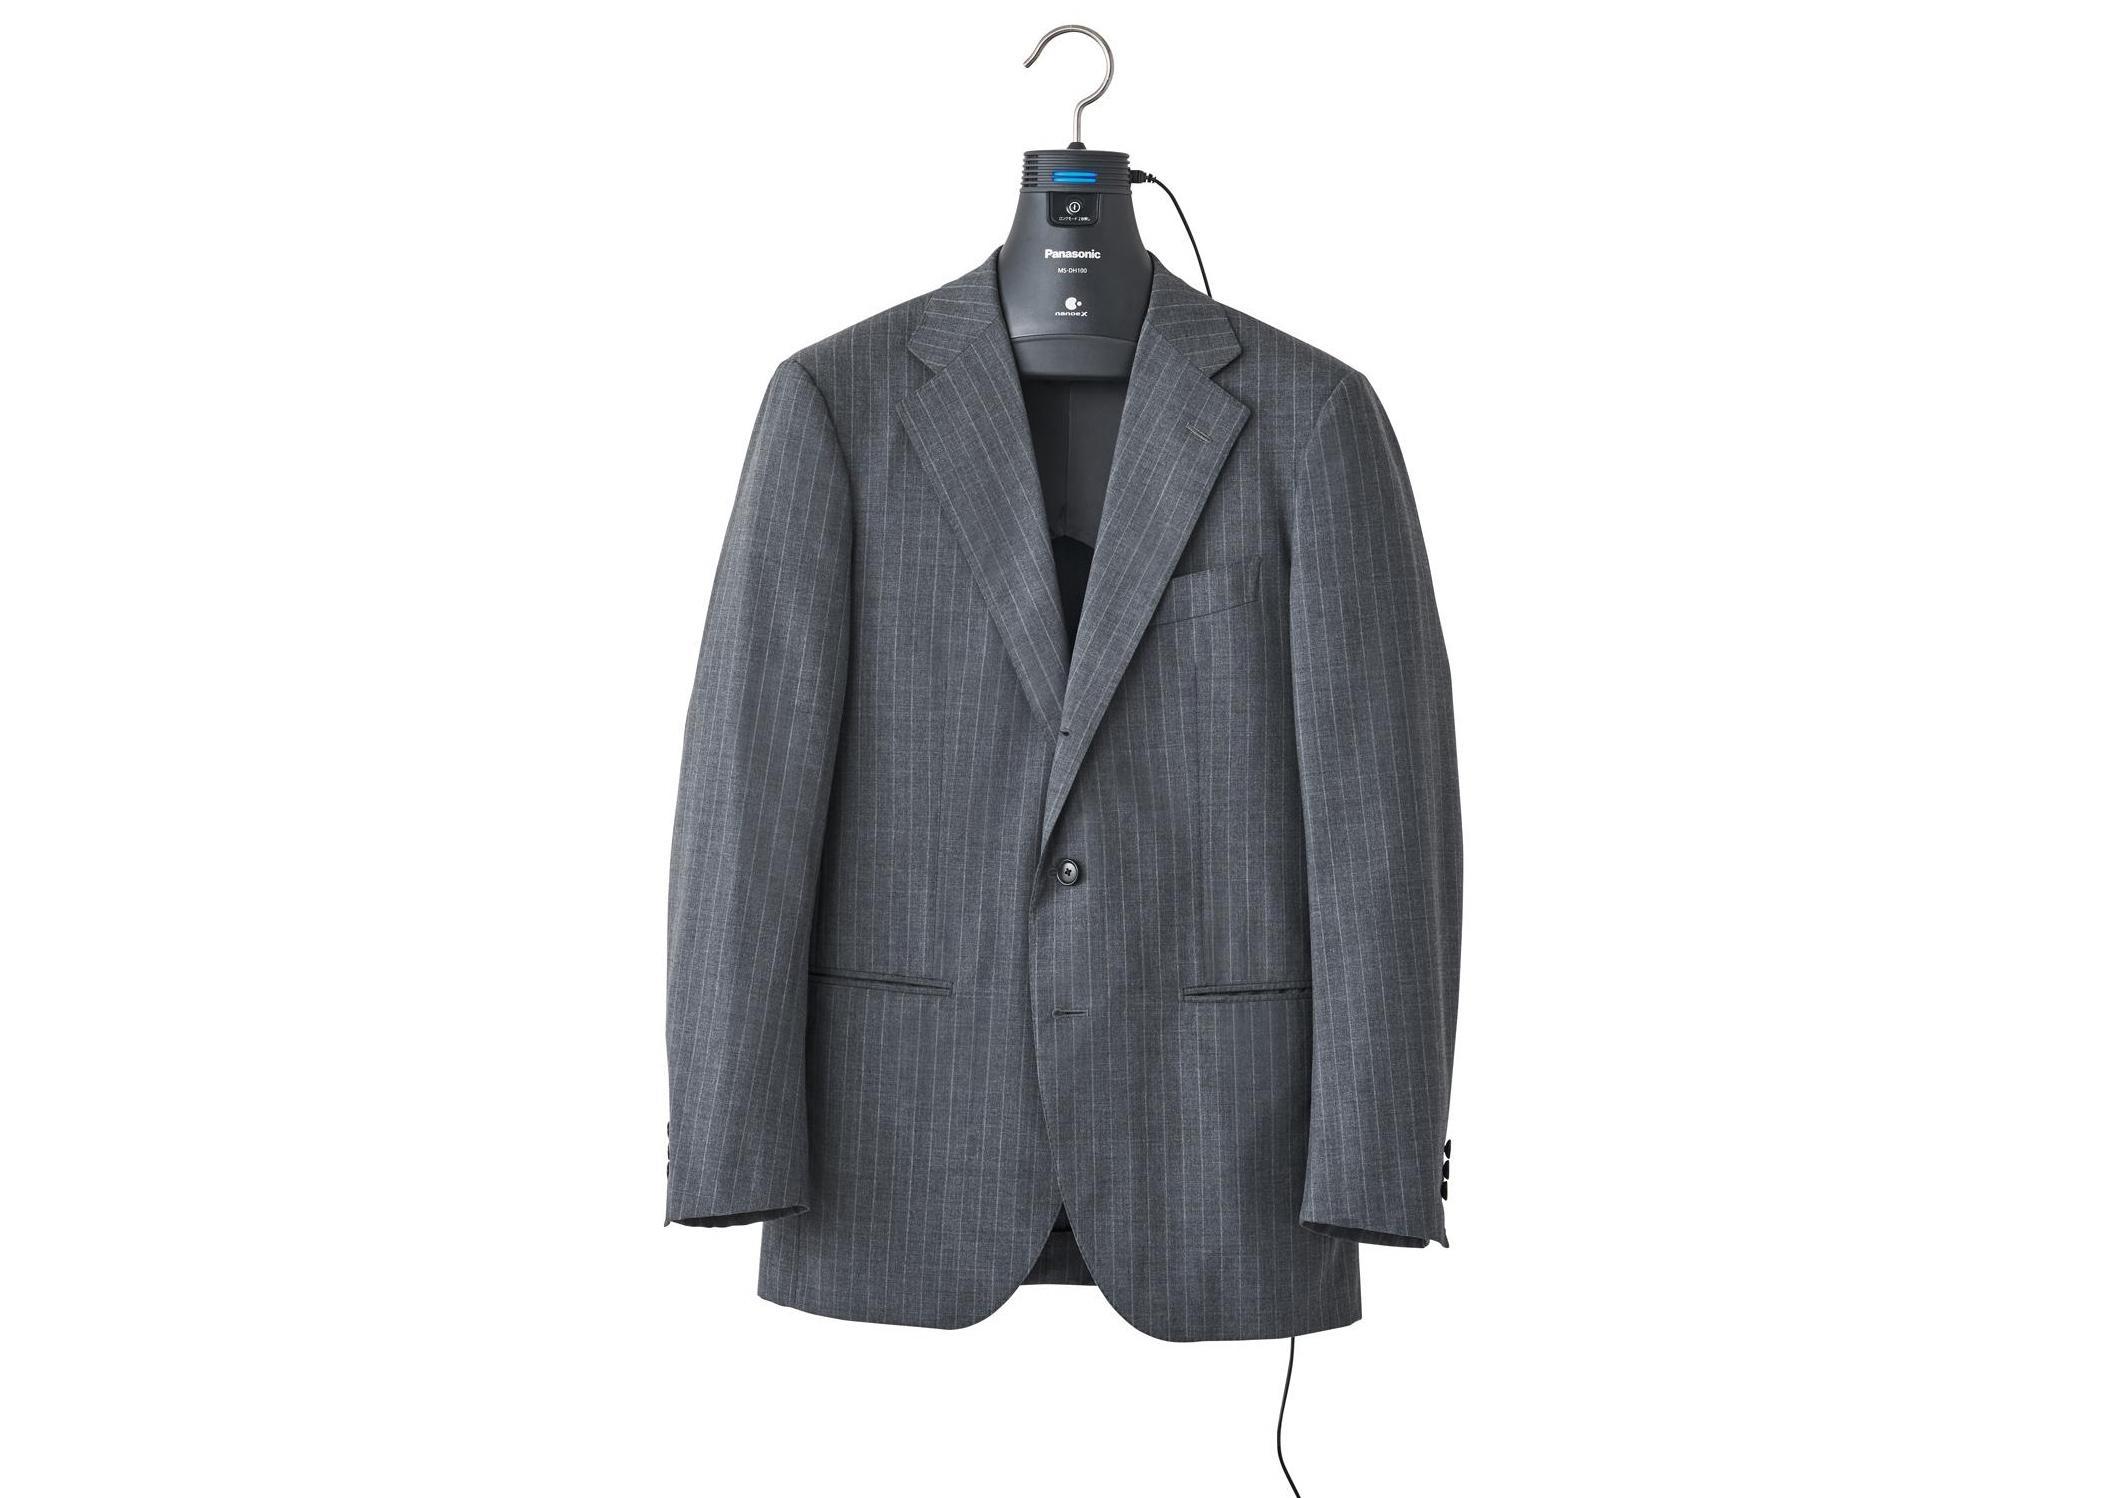 photo: jacket_hanger